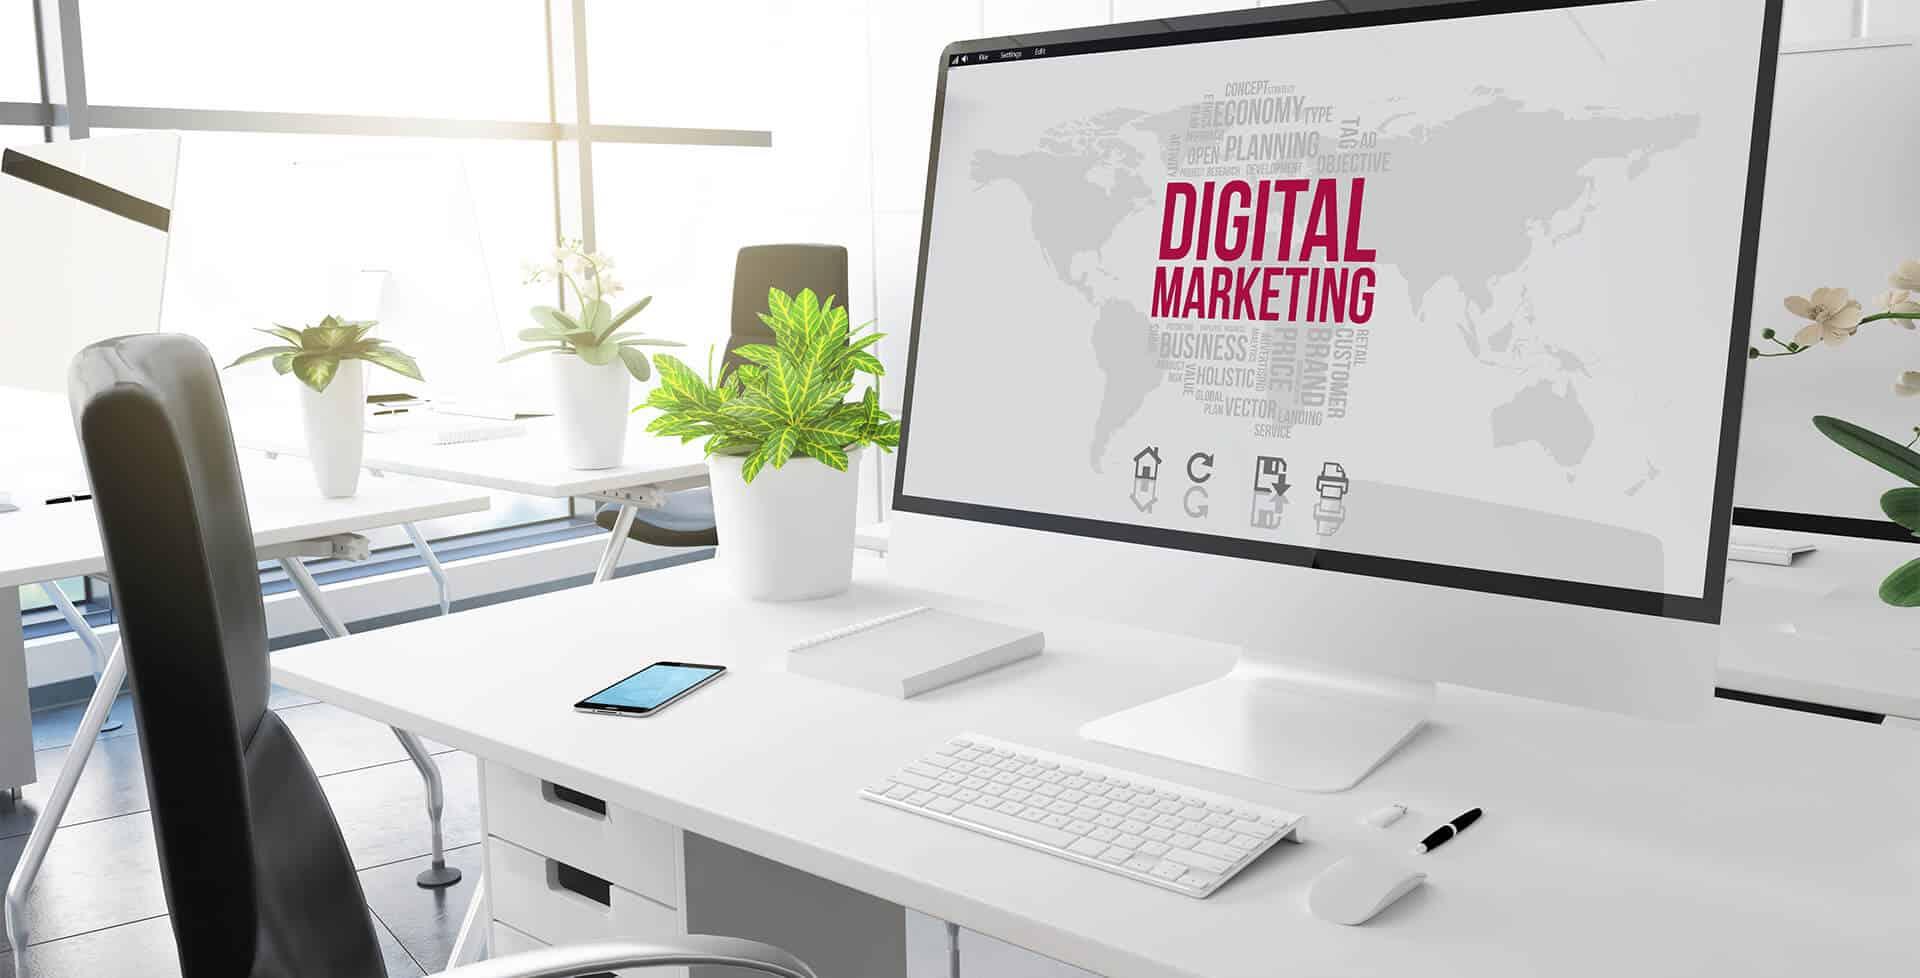 Digital Marketing Services- Key West